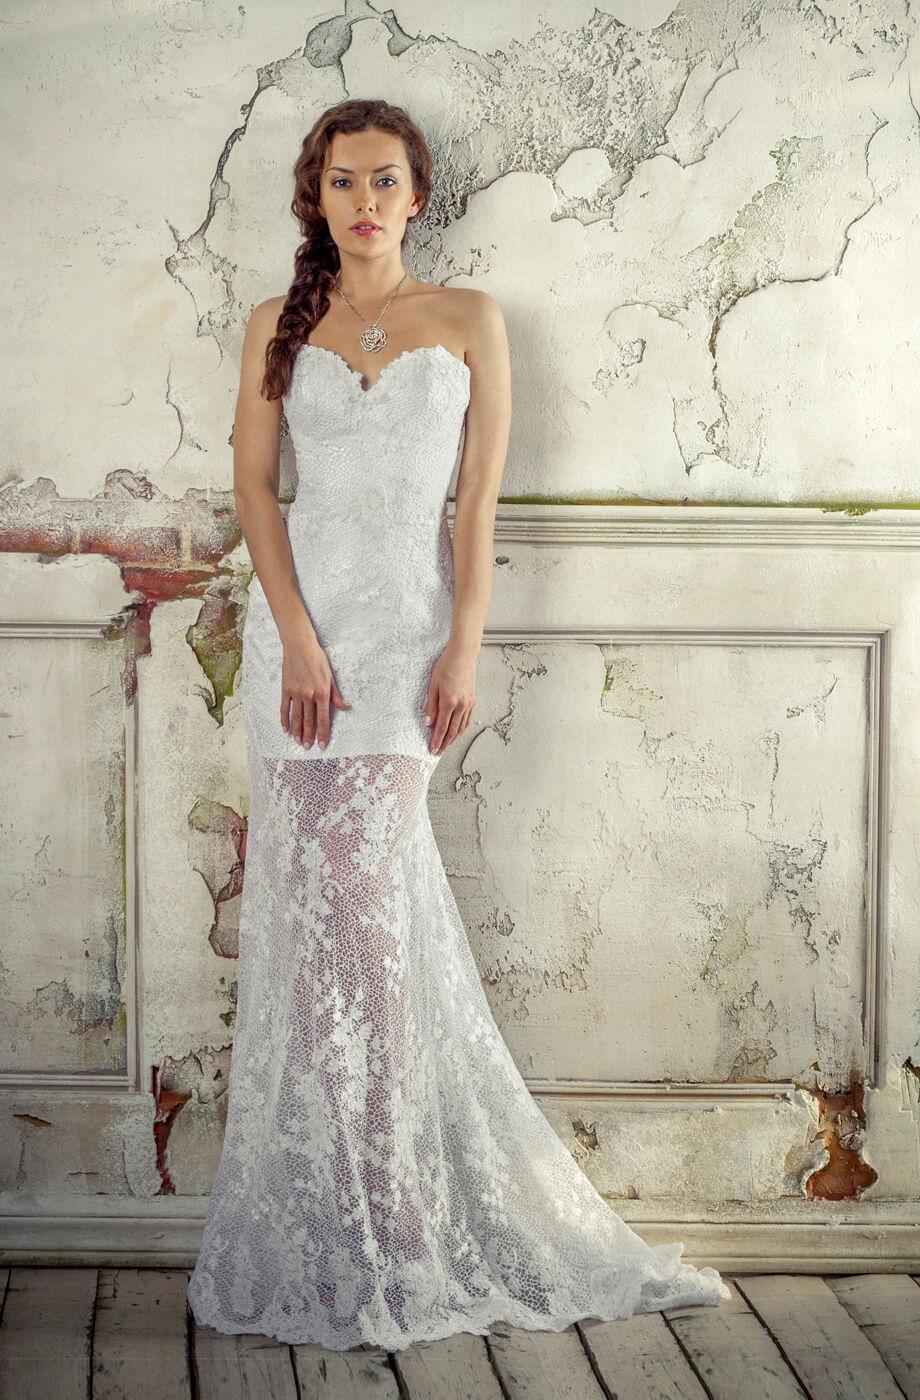 créatrice de robe de mariée lyon